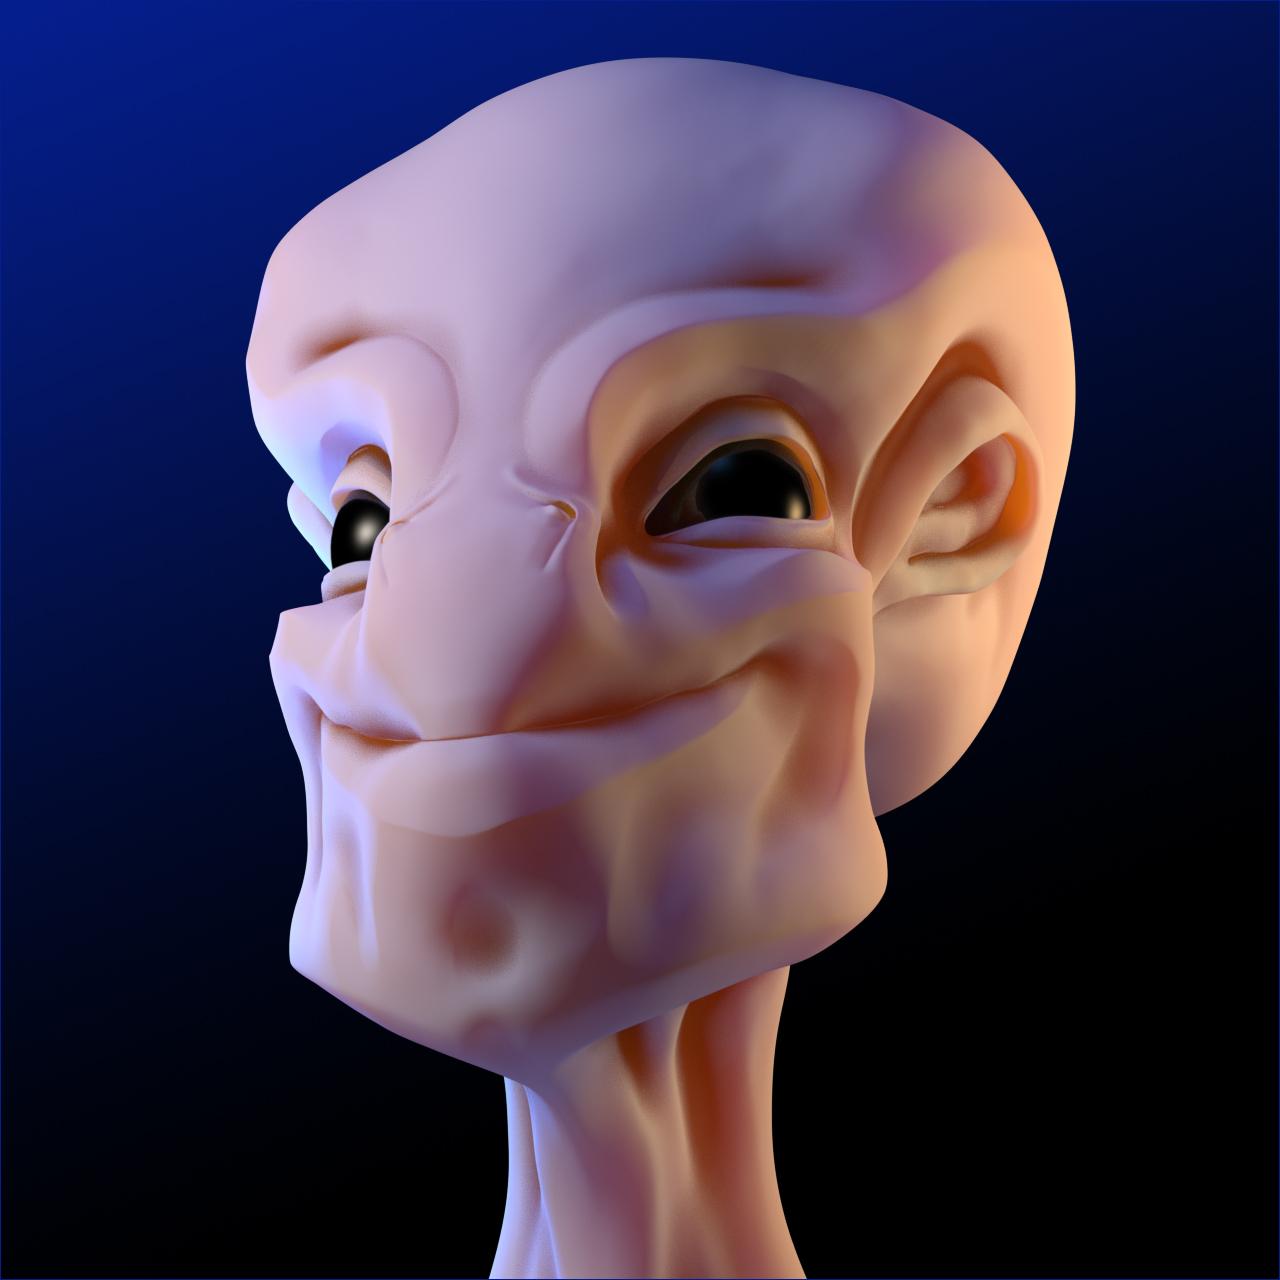 Peter eriksson quick alien head scu 1 bcb122a1 puml